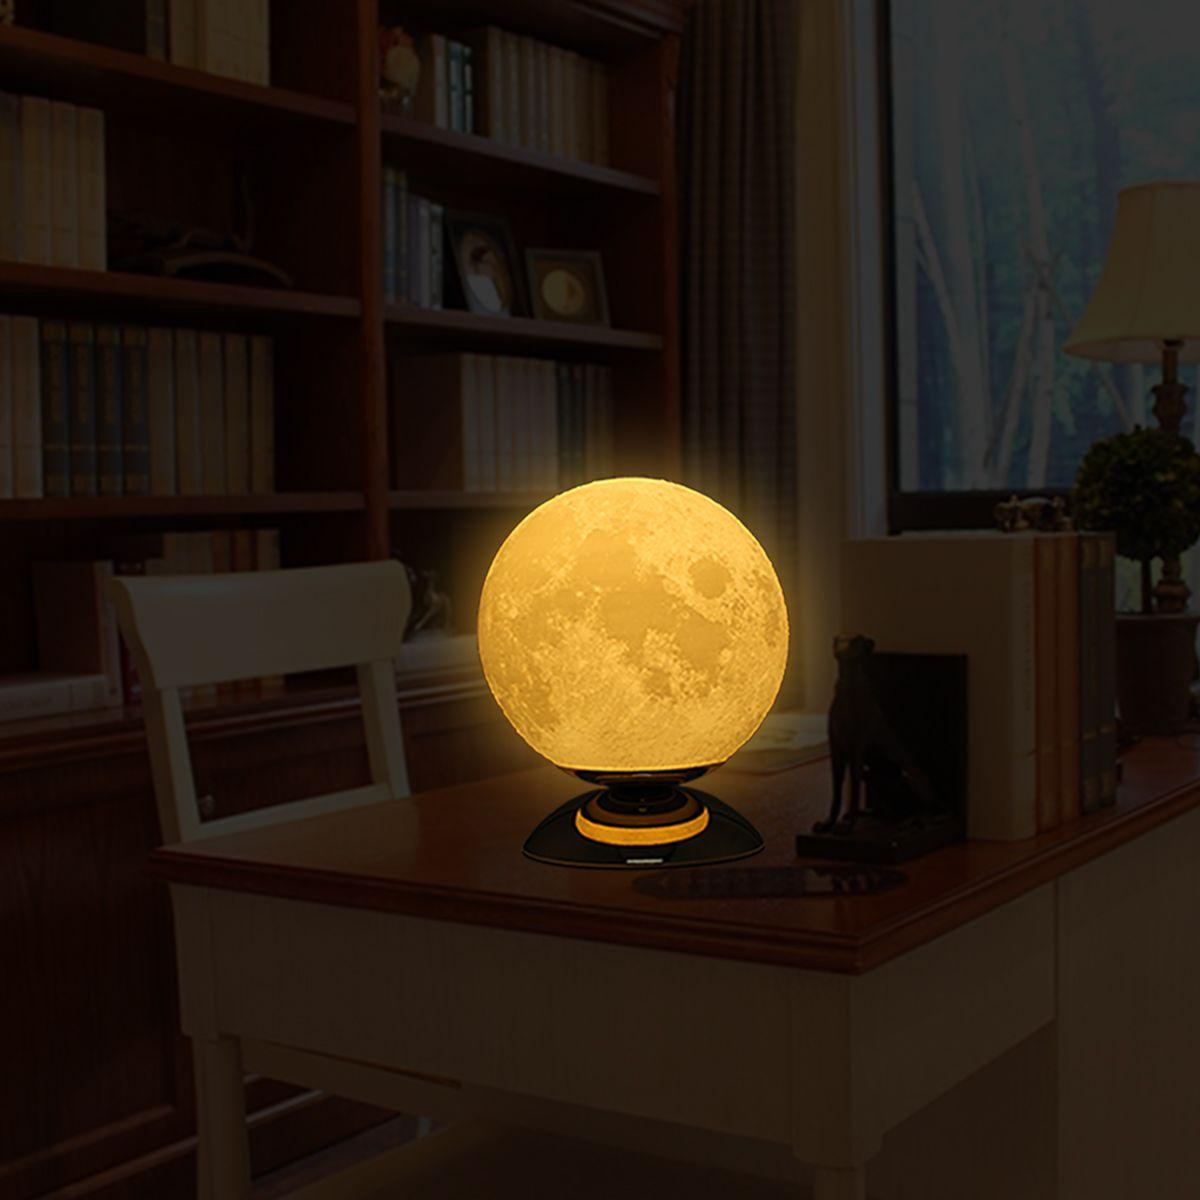 Moon Lamp 3D Printing Lamp Modern Sculpture Home Decoration Ornament Artwork Modern Art Moon Lunar Decor Gift US Plug - 6